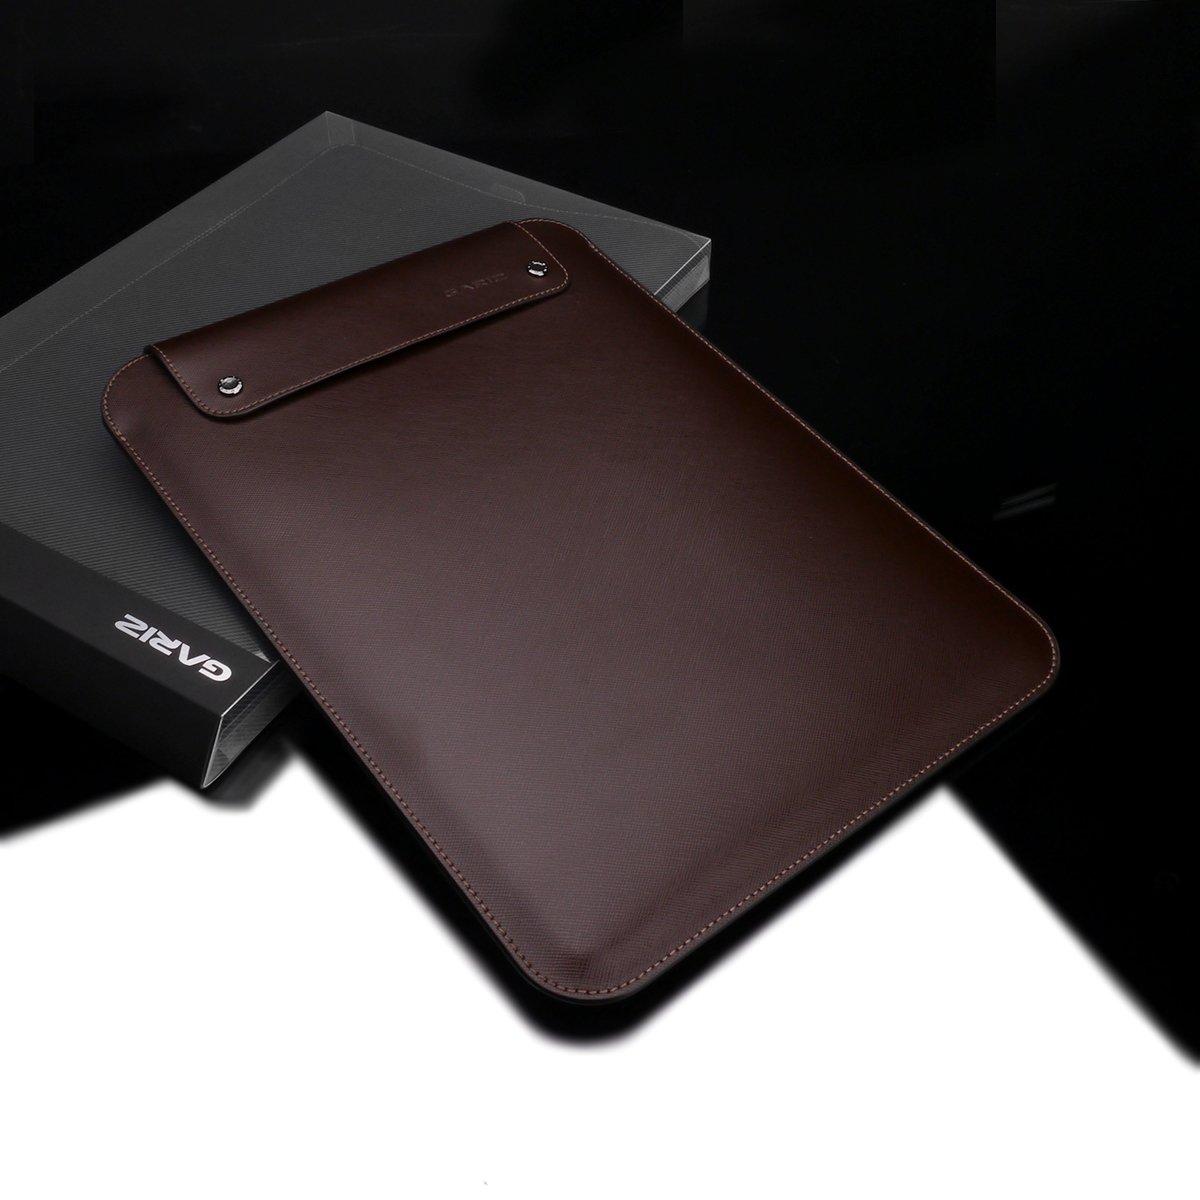 Gariz Apple iPad Pro 12.9 Leather Case Pouch PL-IPDPBR, Brown